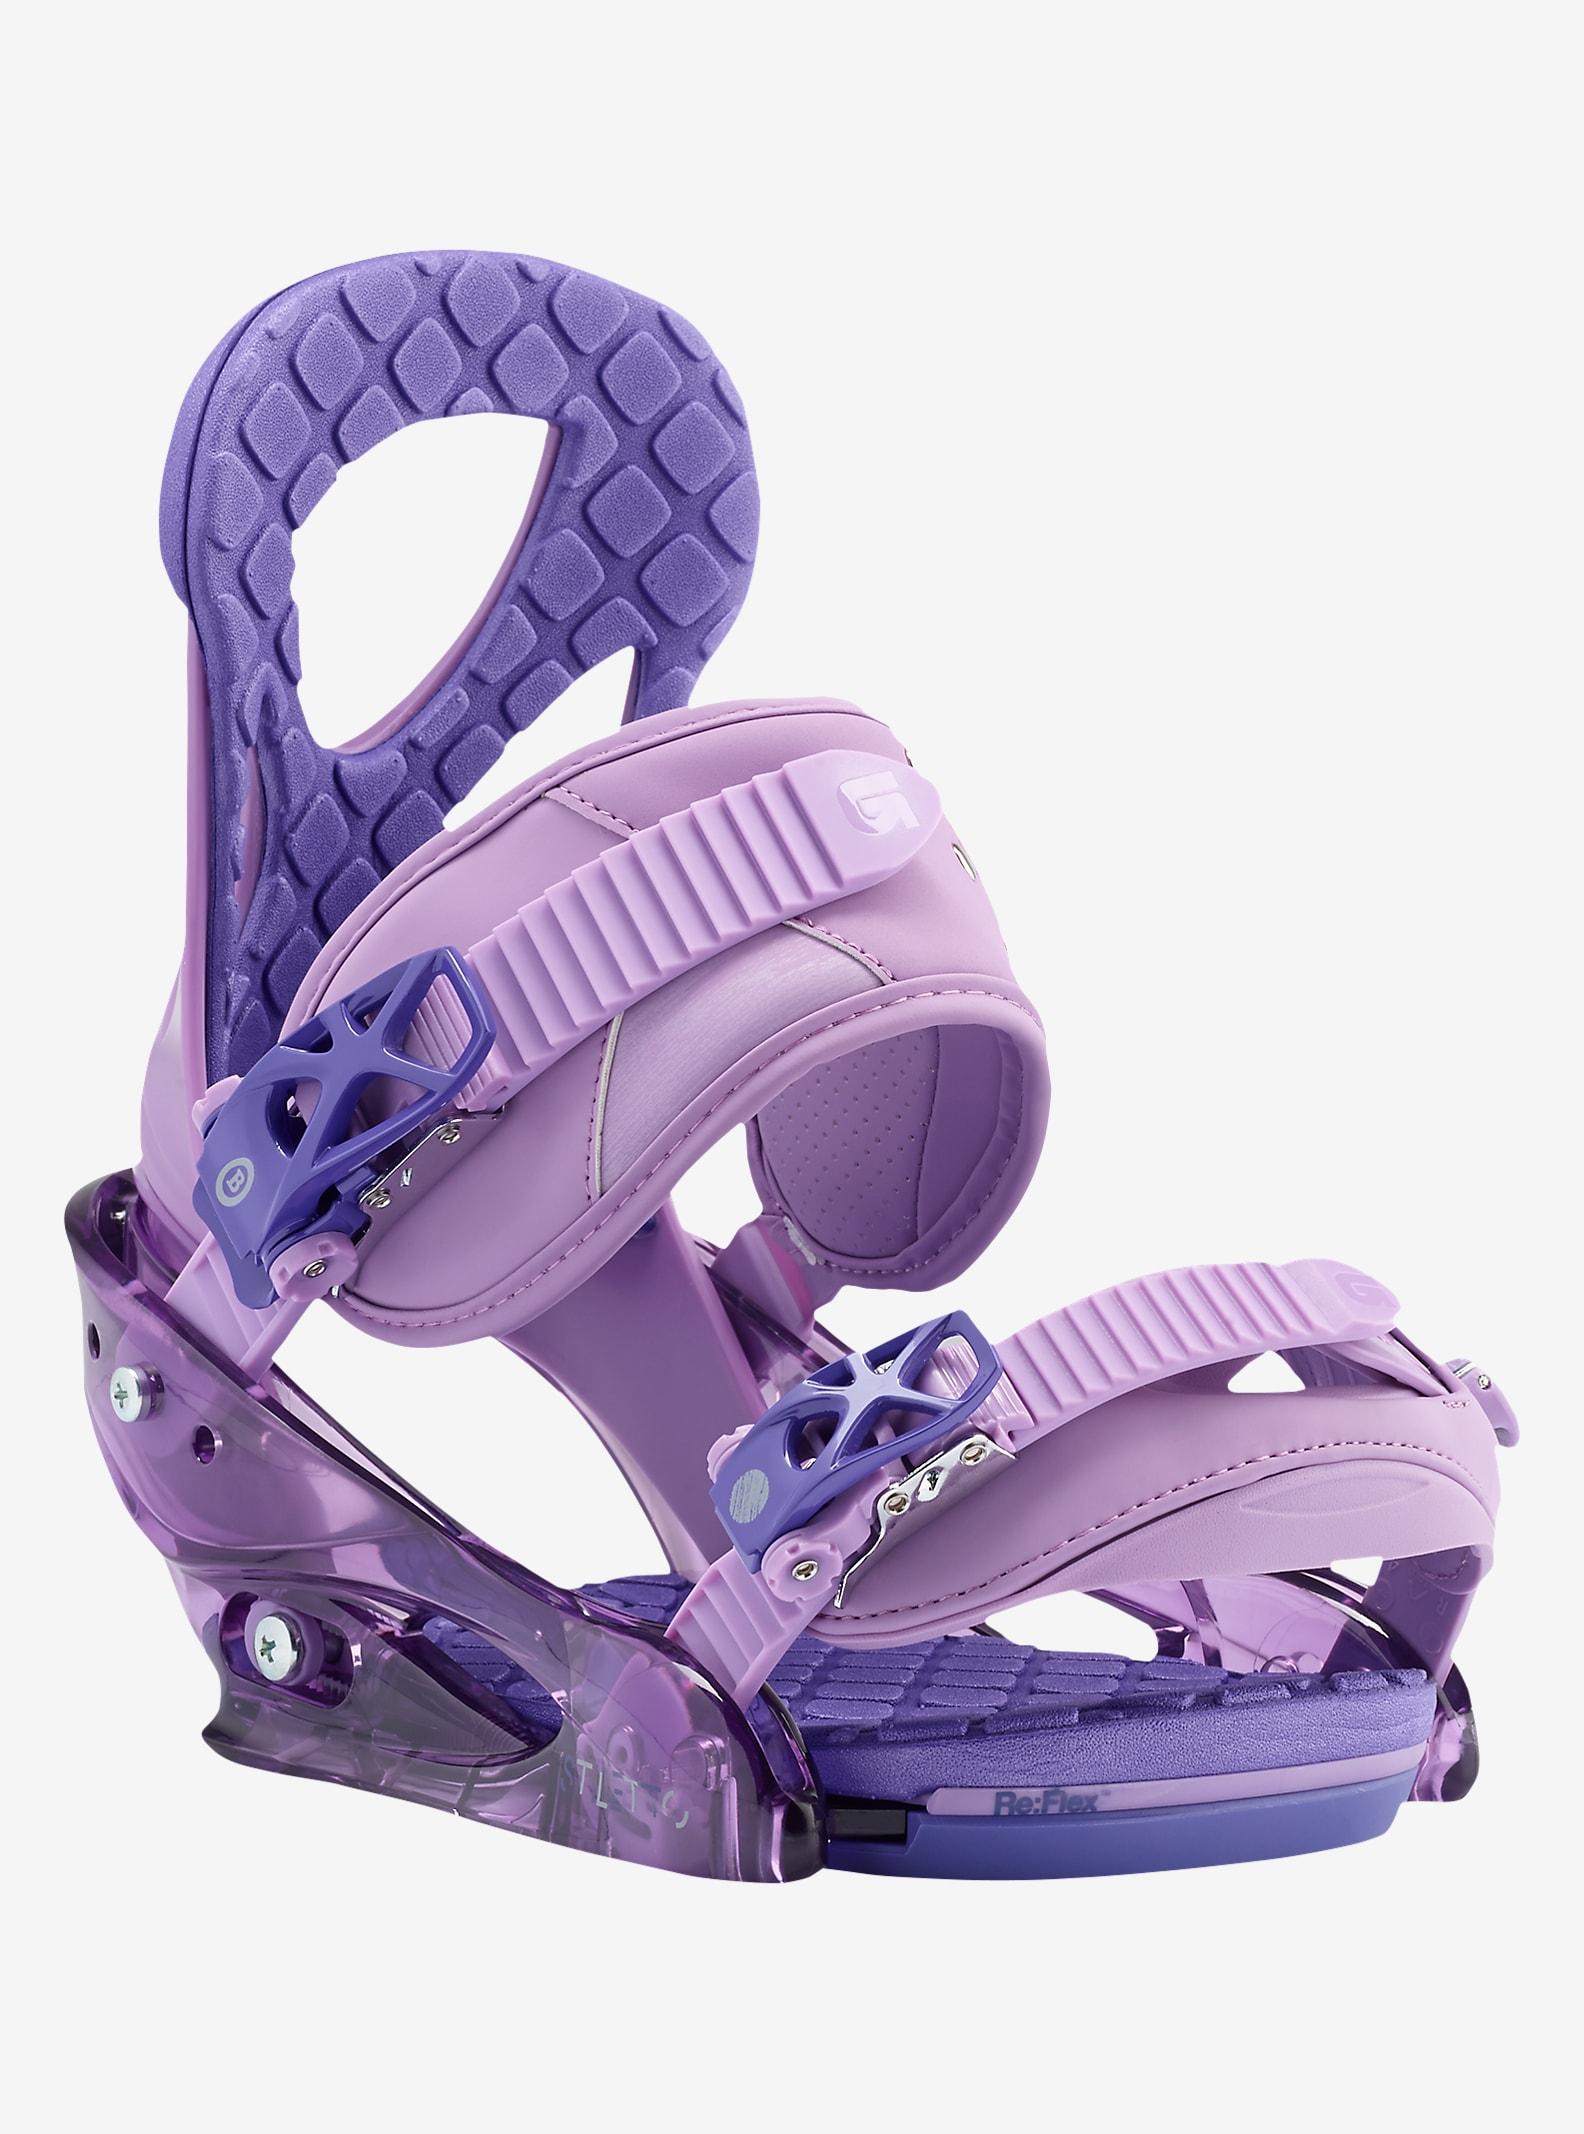 Burton Stiletto Snowboard Binding shown in Purple